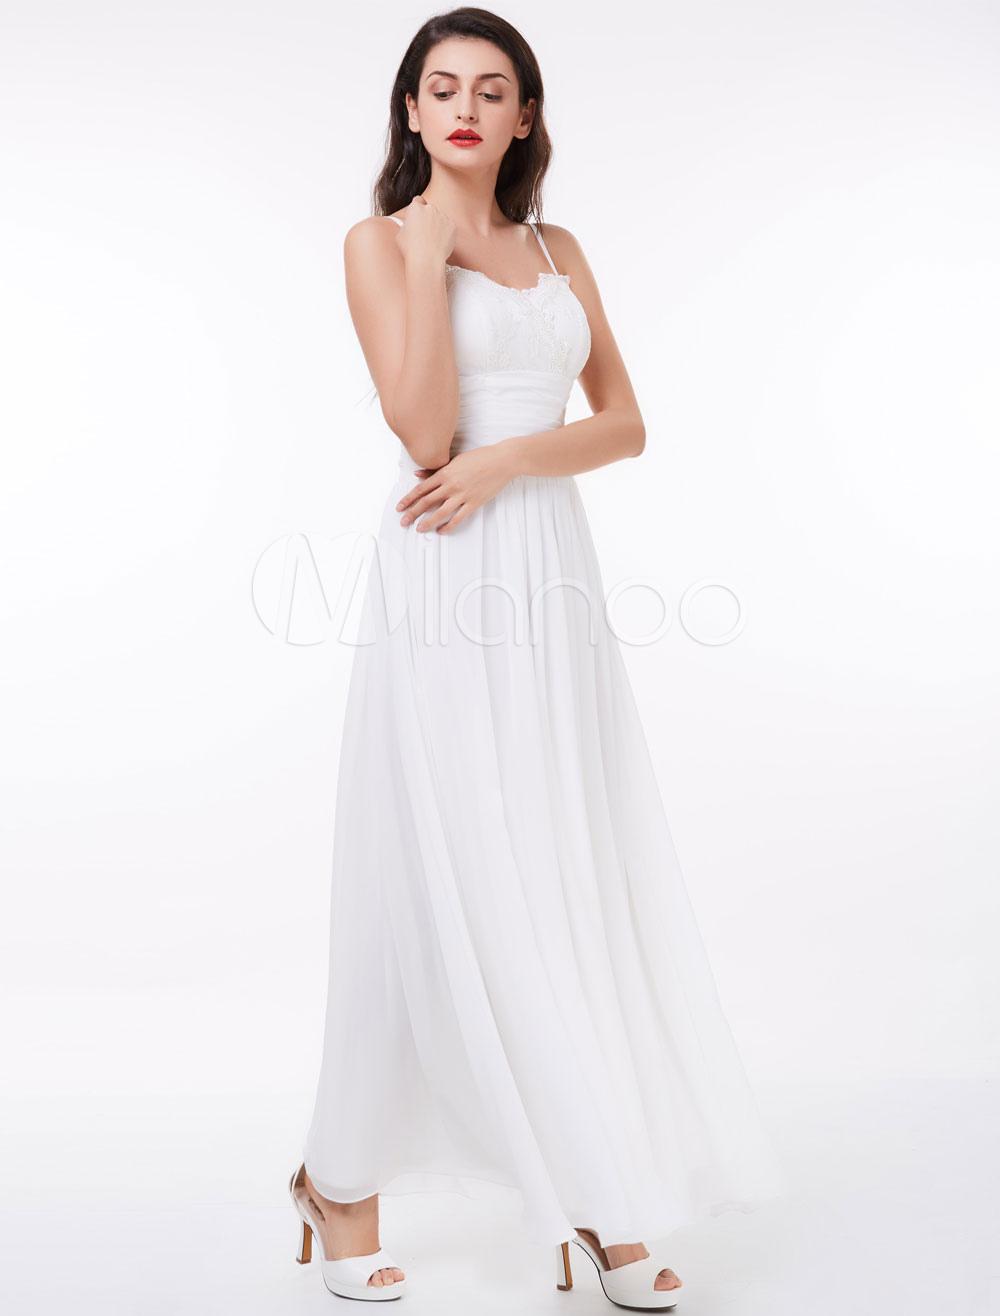 White Prom Dresses Chiffon Spaghetti Straps Lace Pleated Floor Length Long Bridesmaid Dress (Wedding Cheap Party Dress) photo